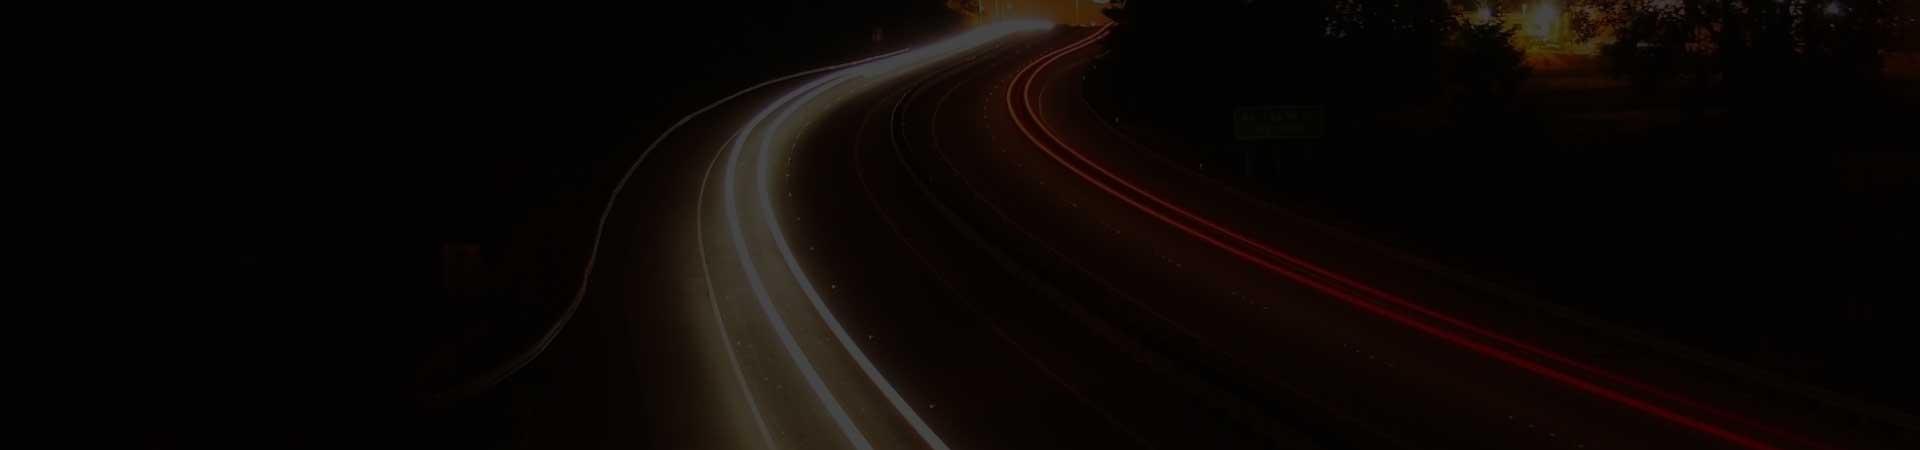 road_light_motion_87263_1920x1080